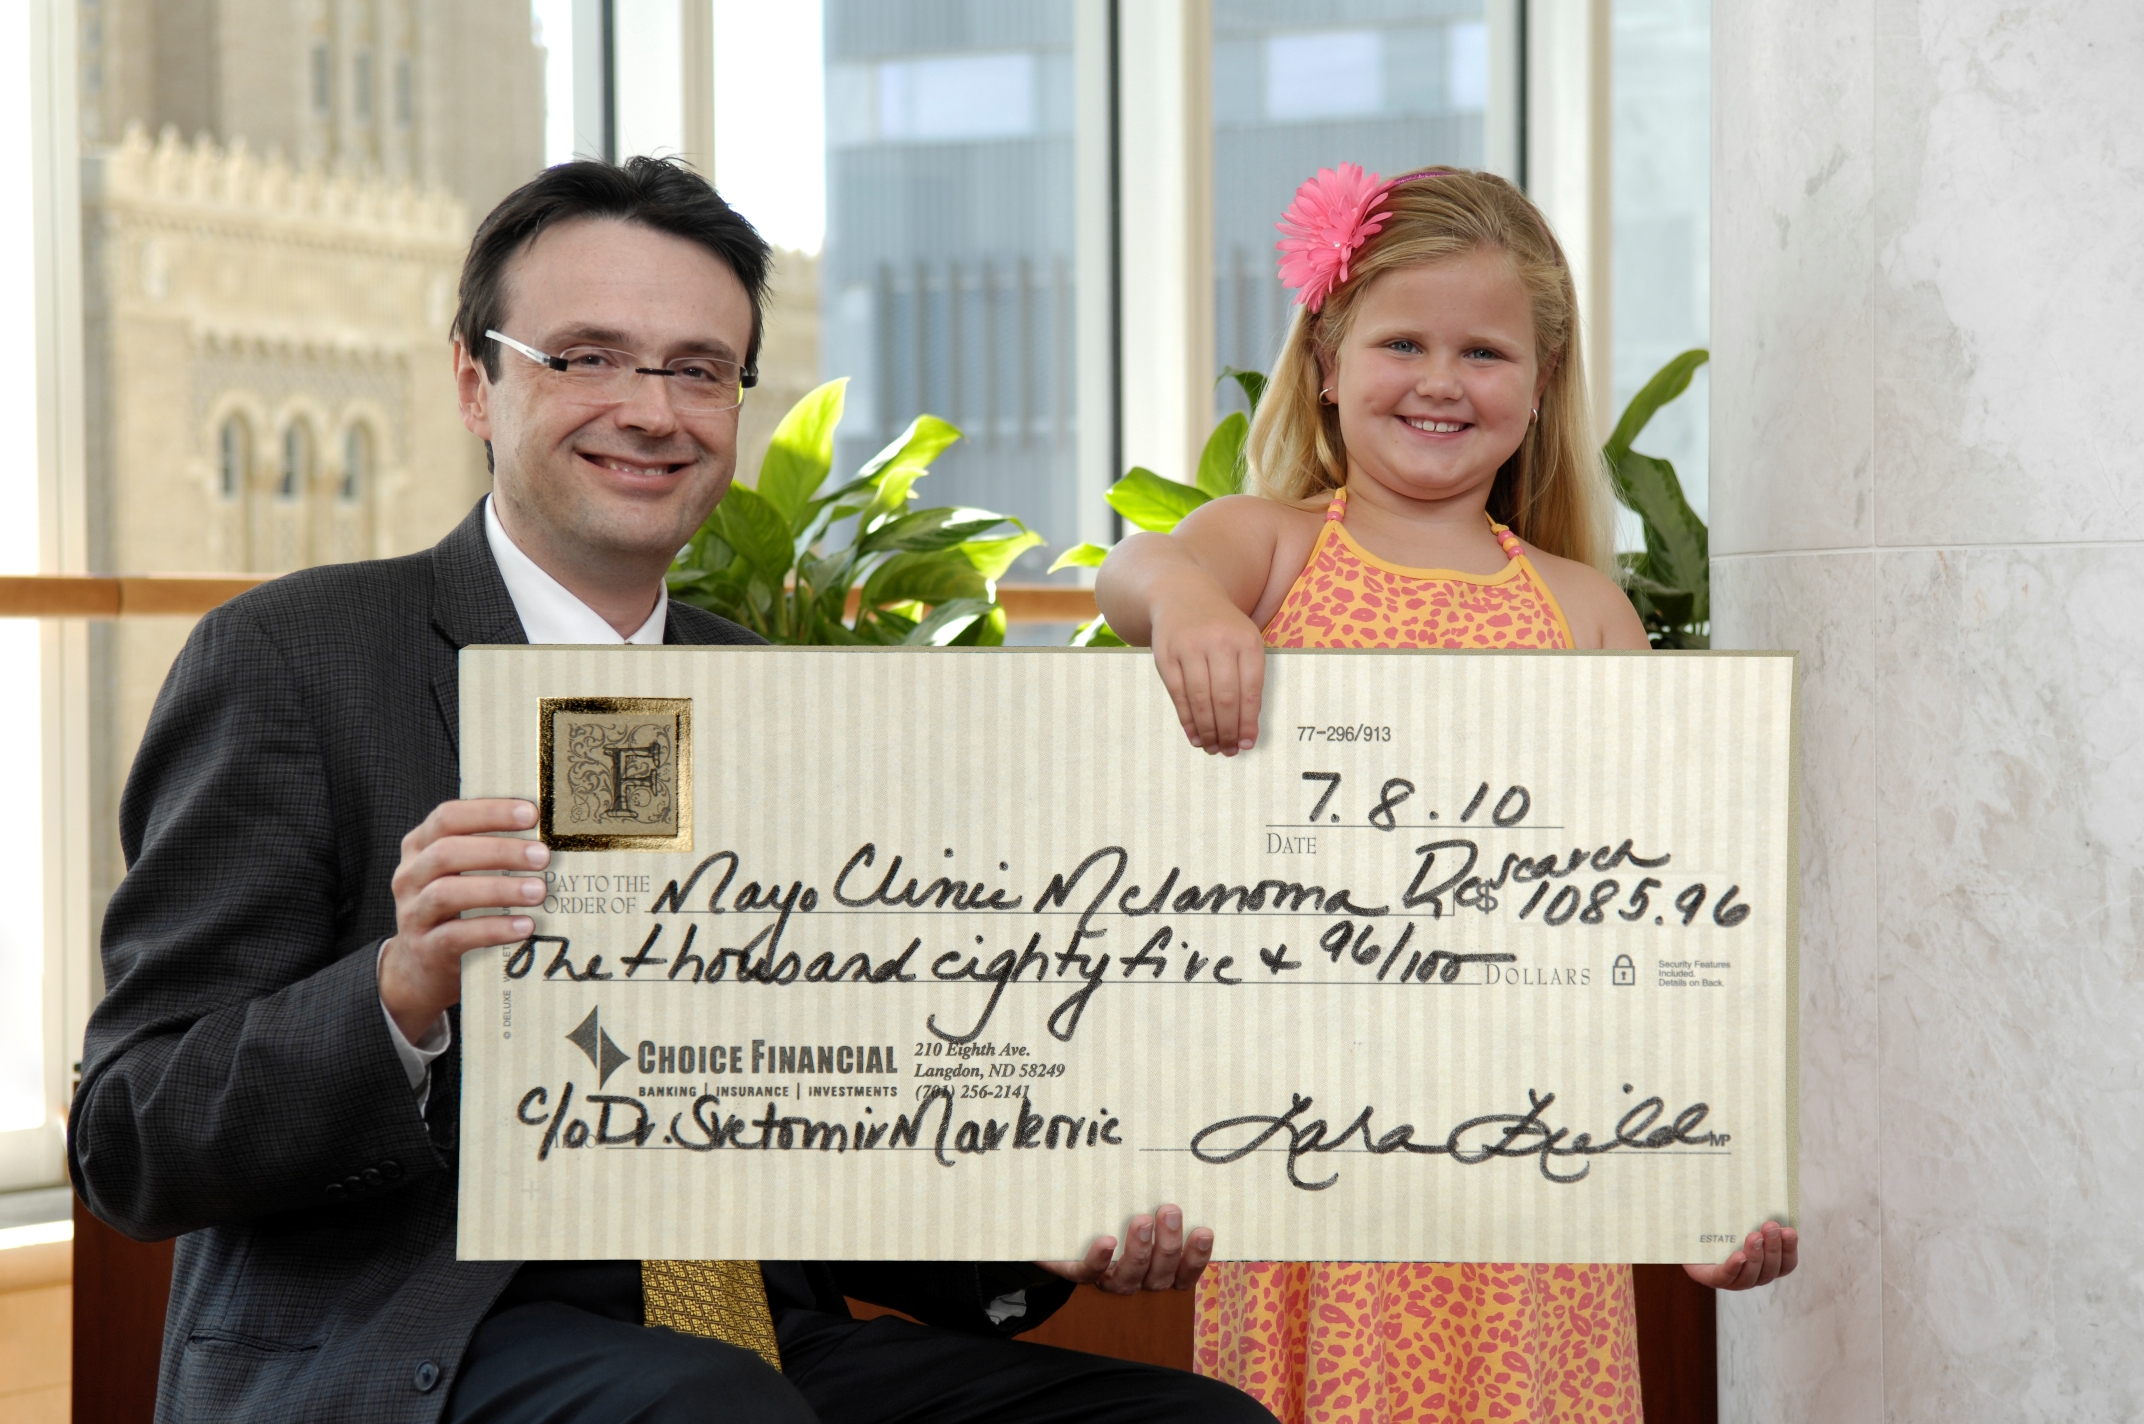 Emma and Dr. Svetomir Markovic